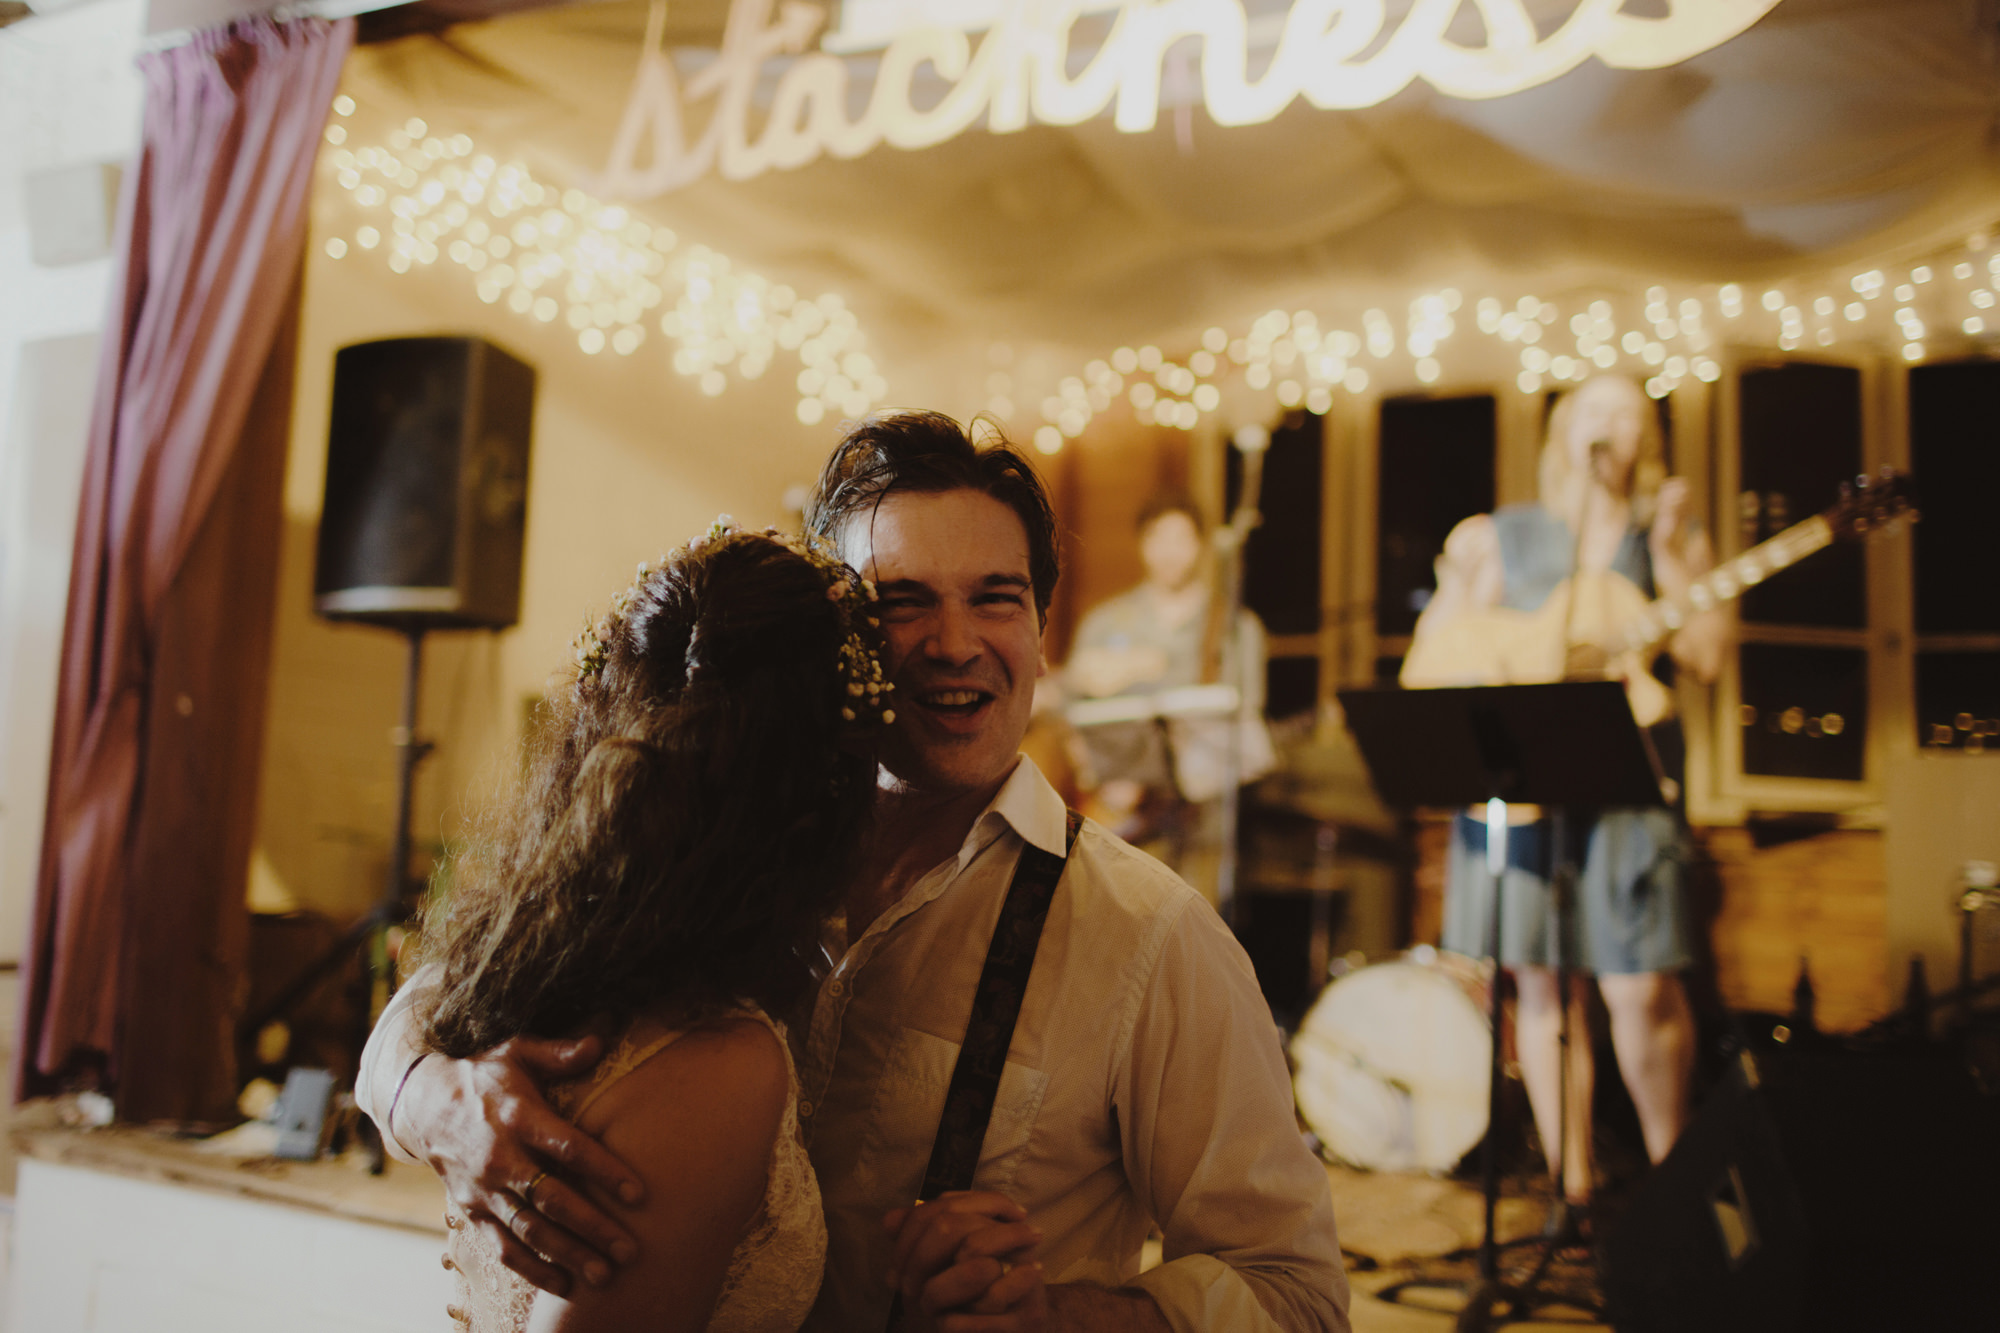 catskills_big_indian_springs_upstate_NY_wedding_sammblake144.jpg